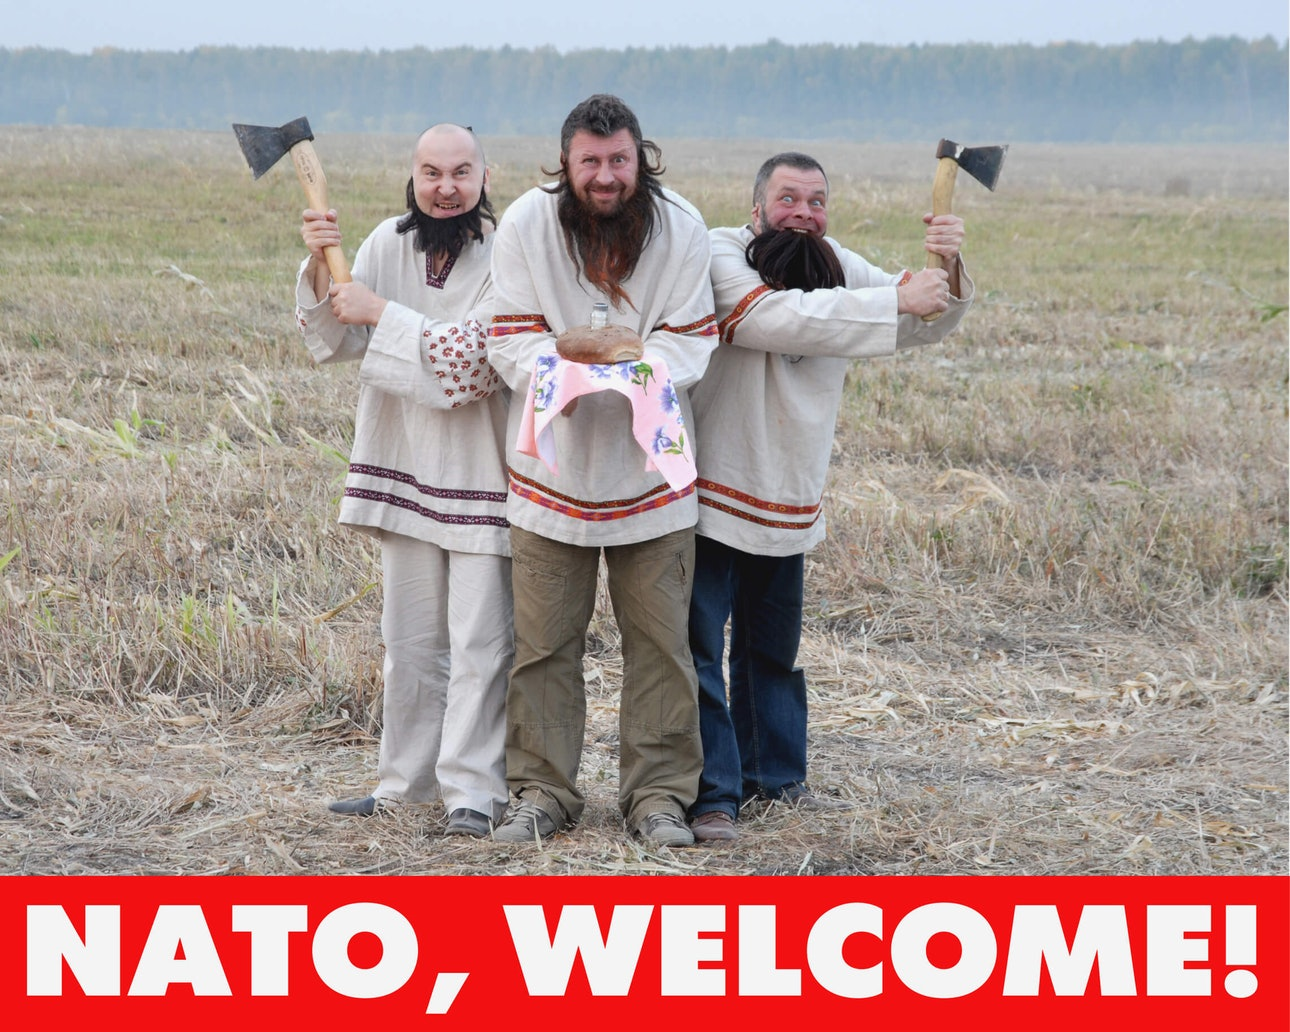 NATO, welcome! (1)